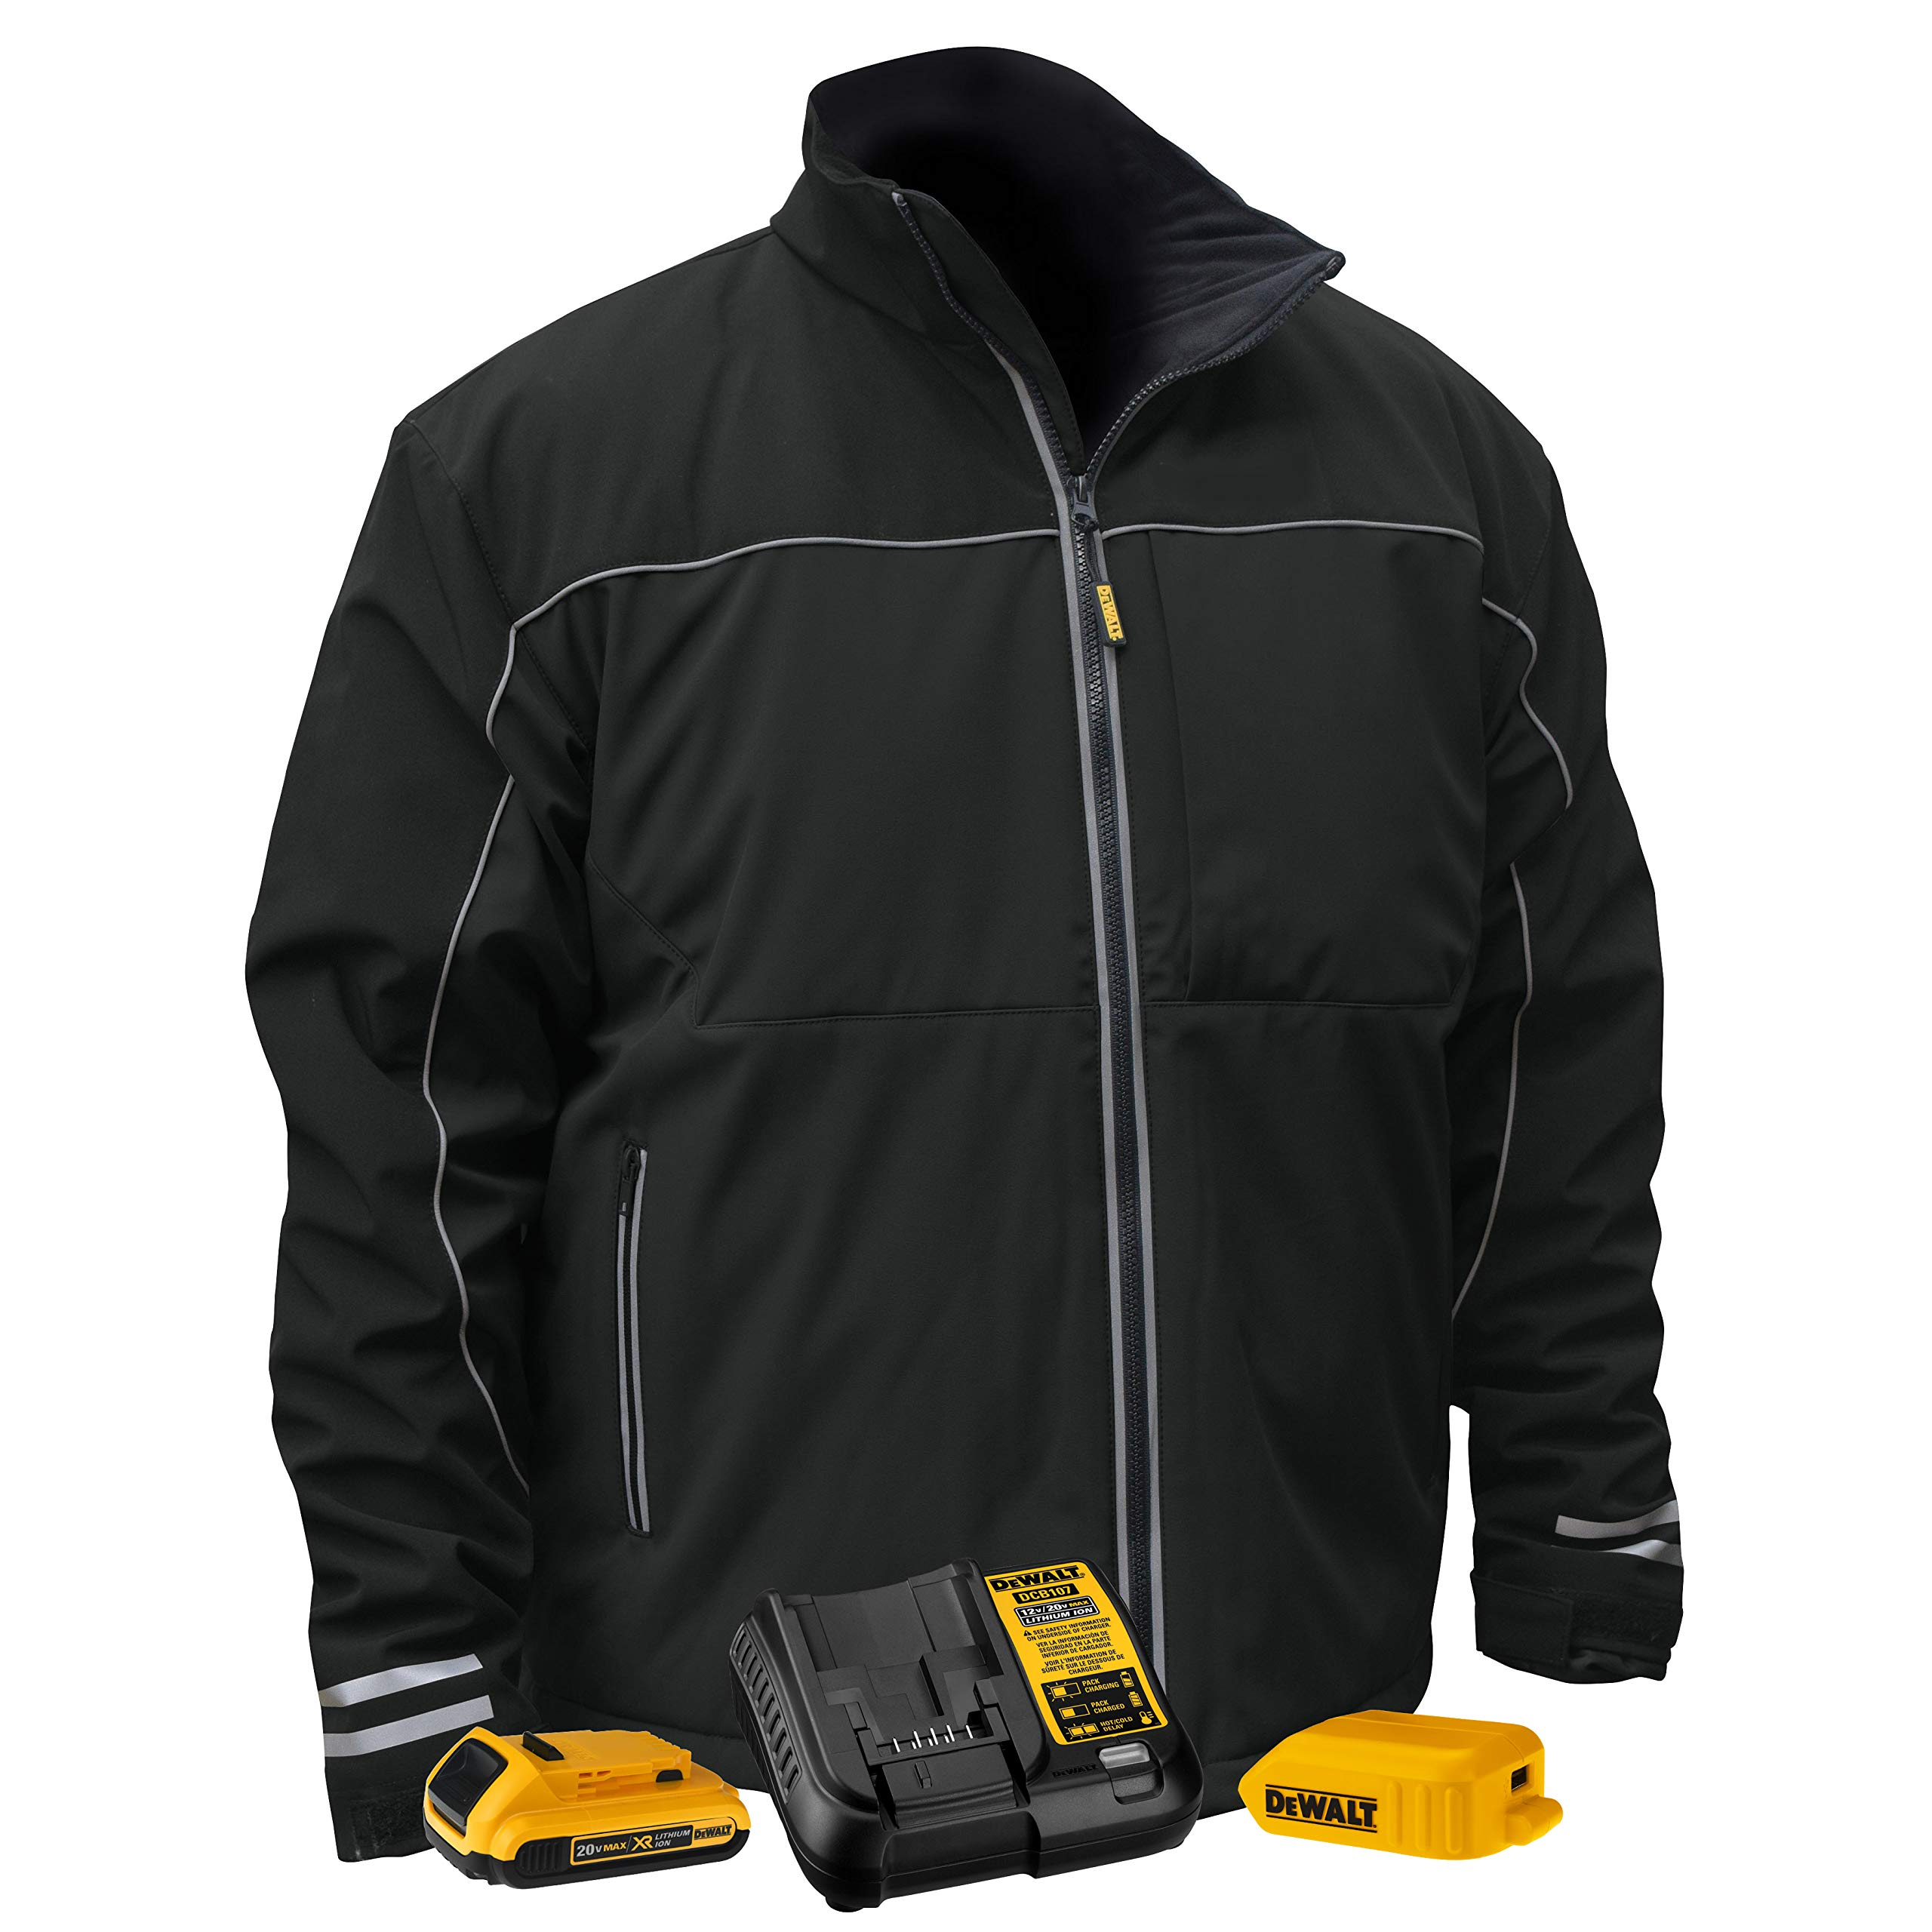 DEWALT DCHJ072D1-L Heated Lightweight Soft Shell Jacket, L, Black by DEWALT (Image #1)